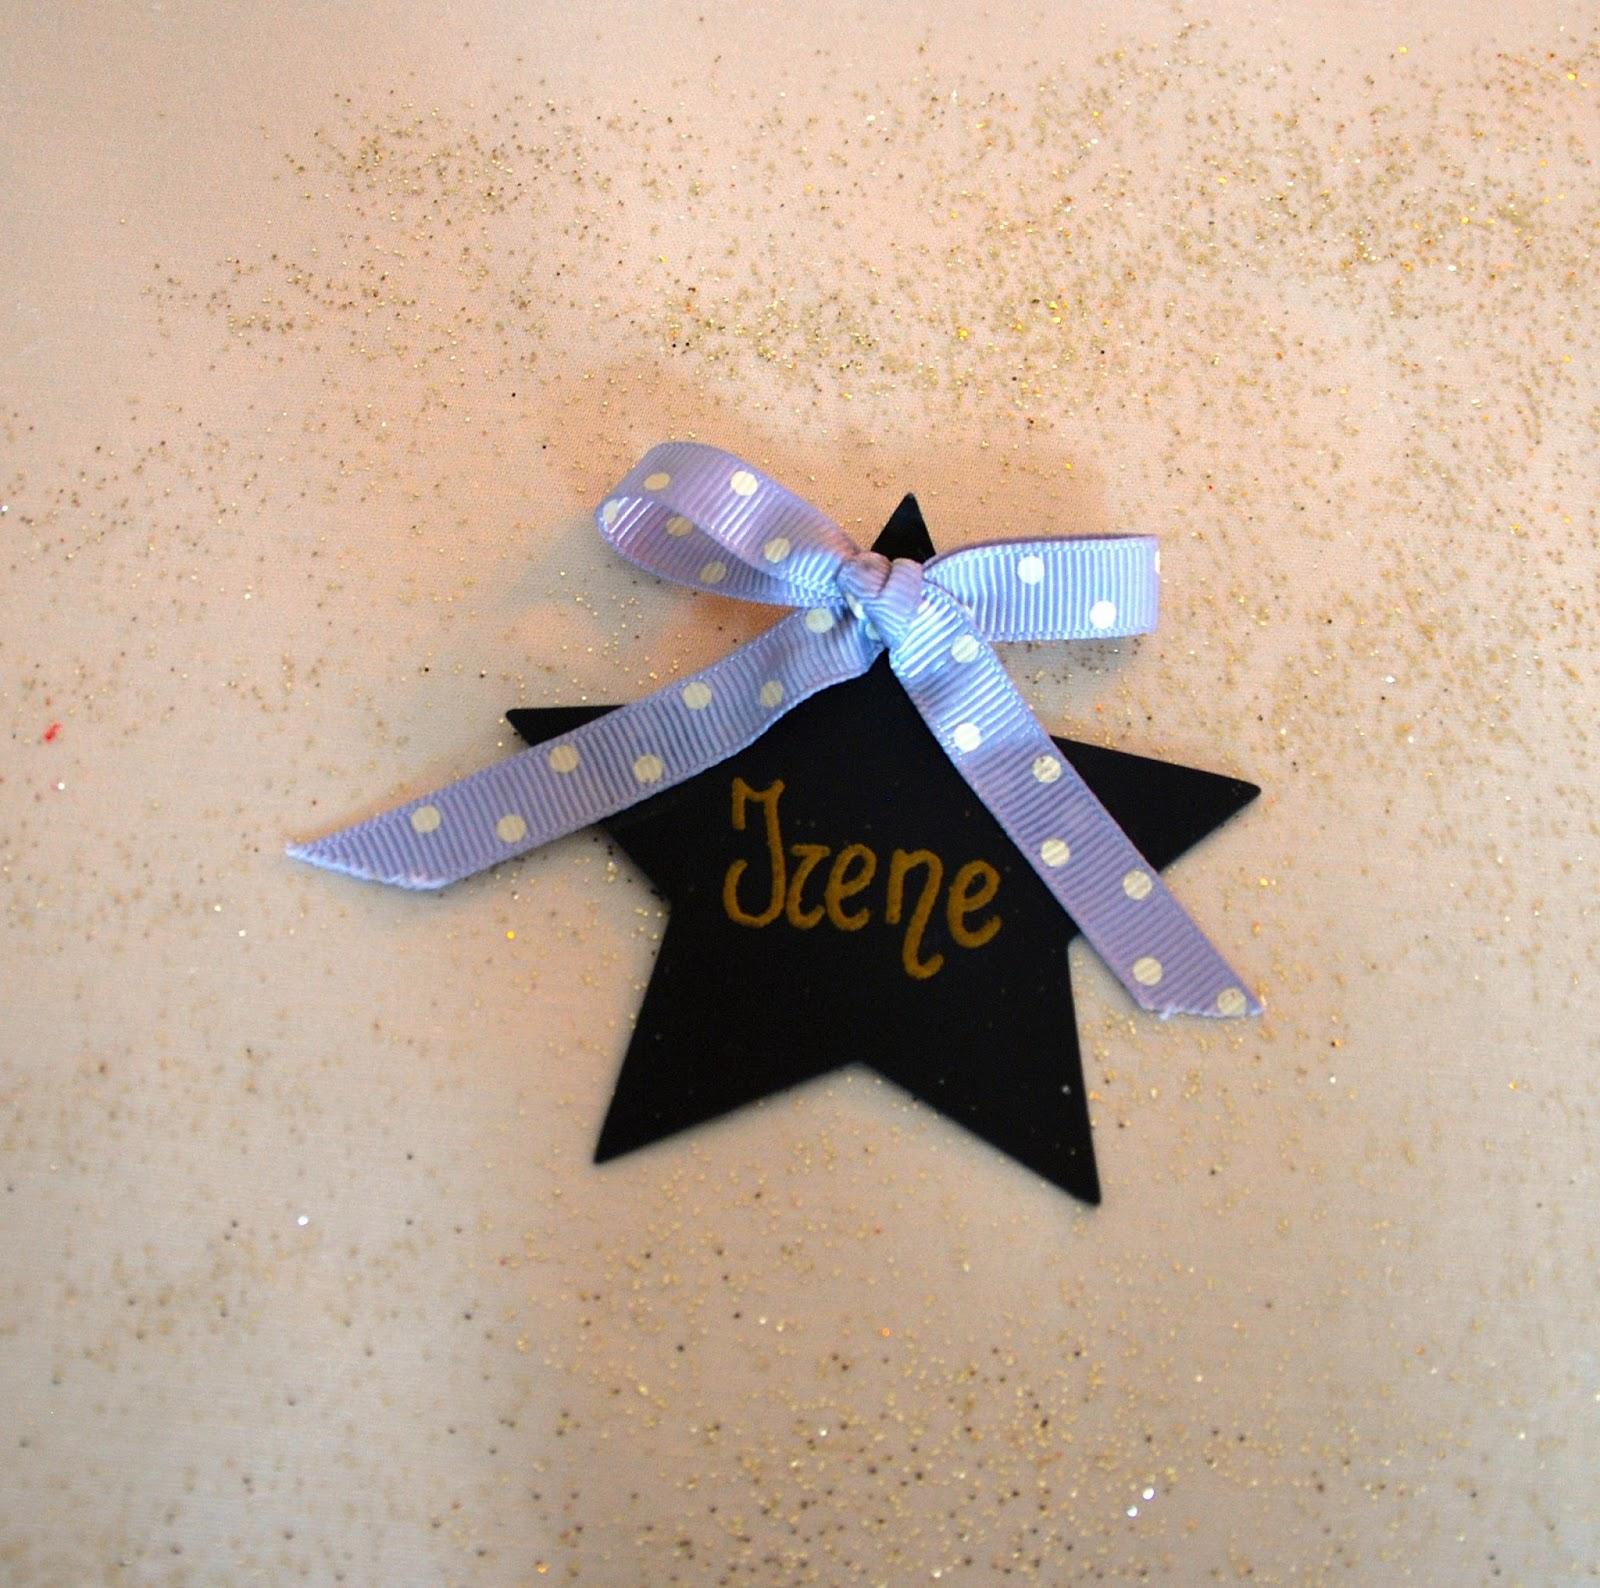 Ceramica Tiffany Civita Castellana.Tavola Per Pasta Ikea